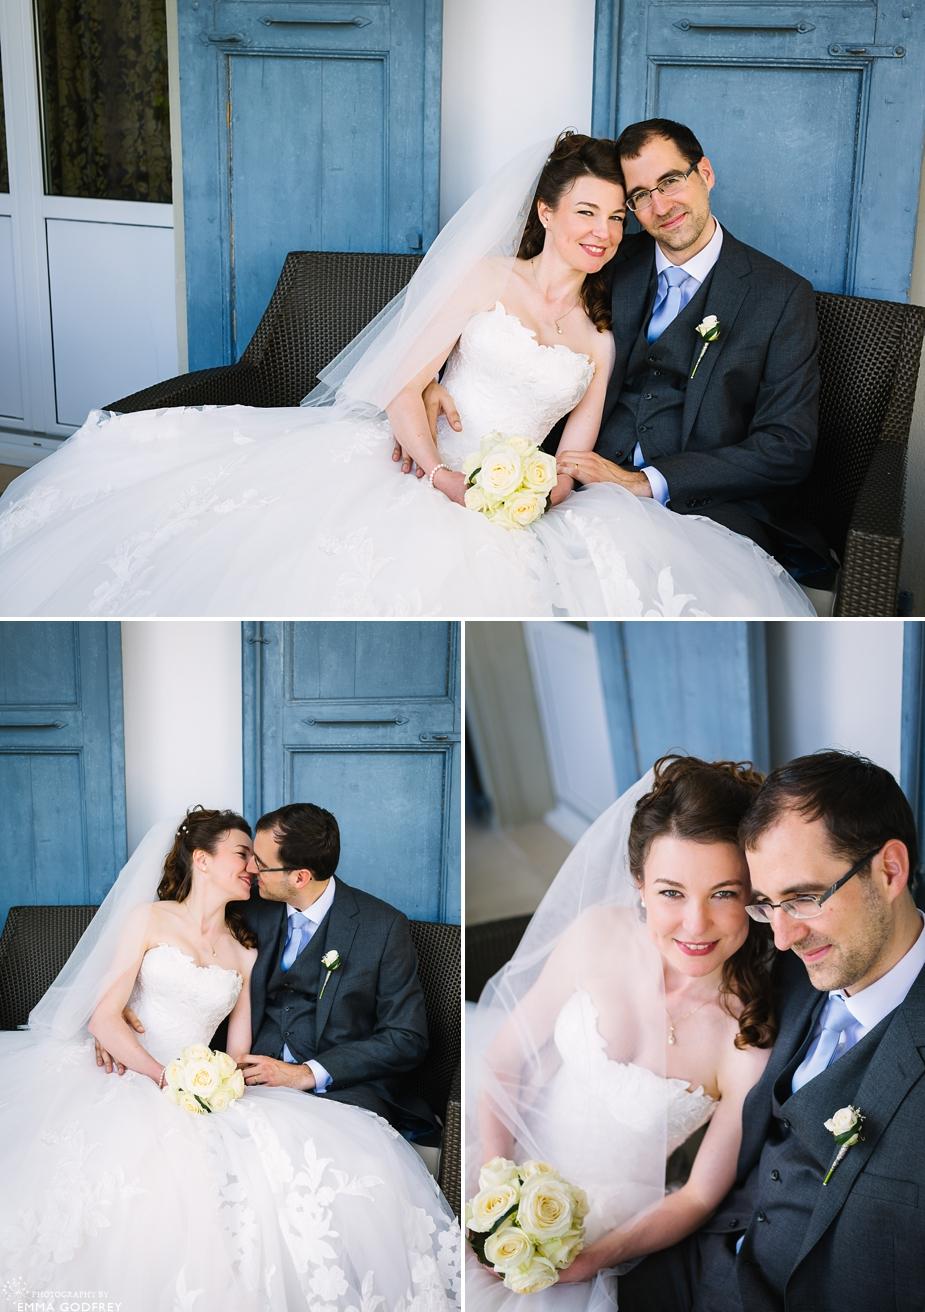 22-Swiss-Wedding-photographer-Vevey.jpg